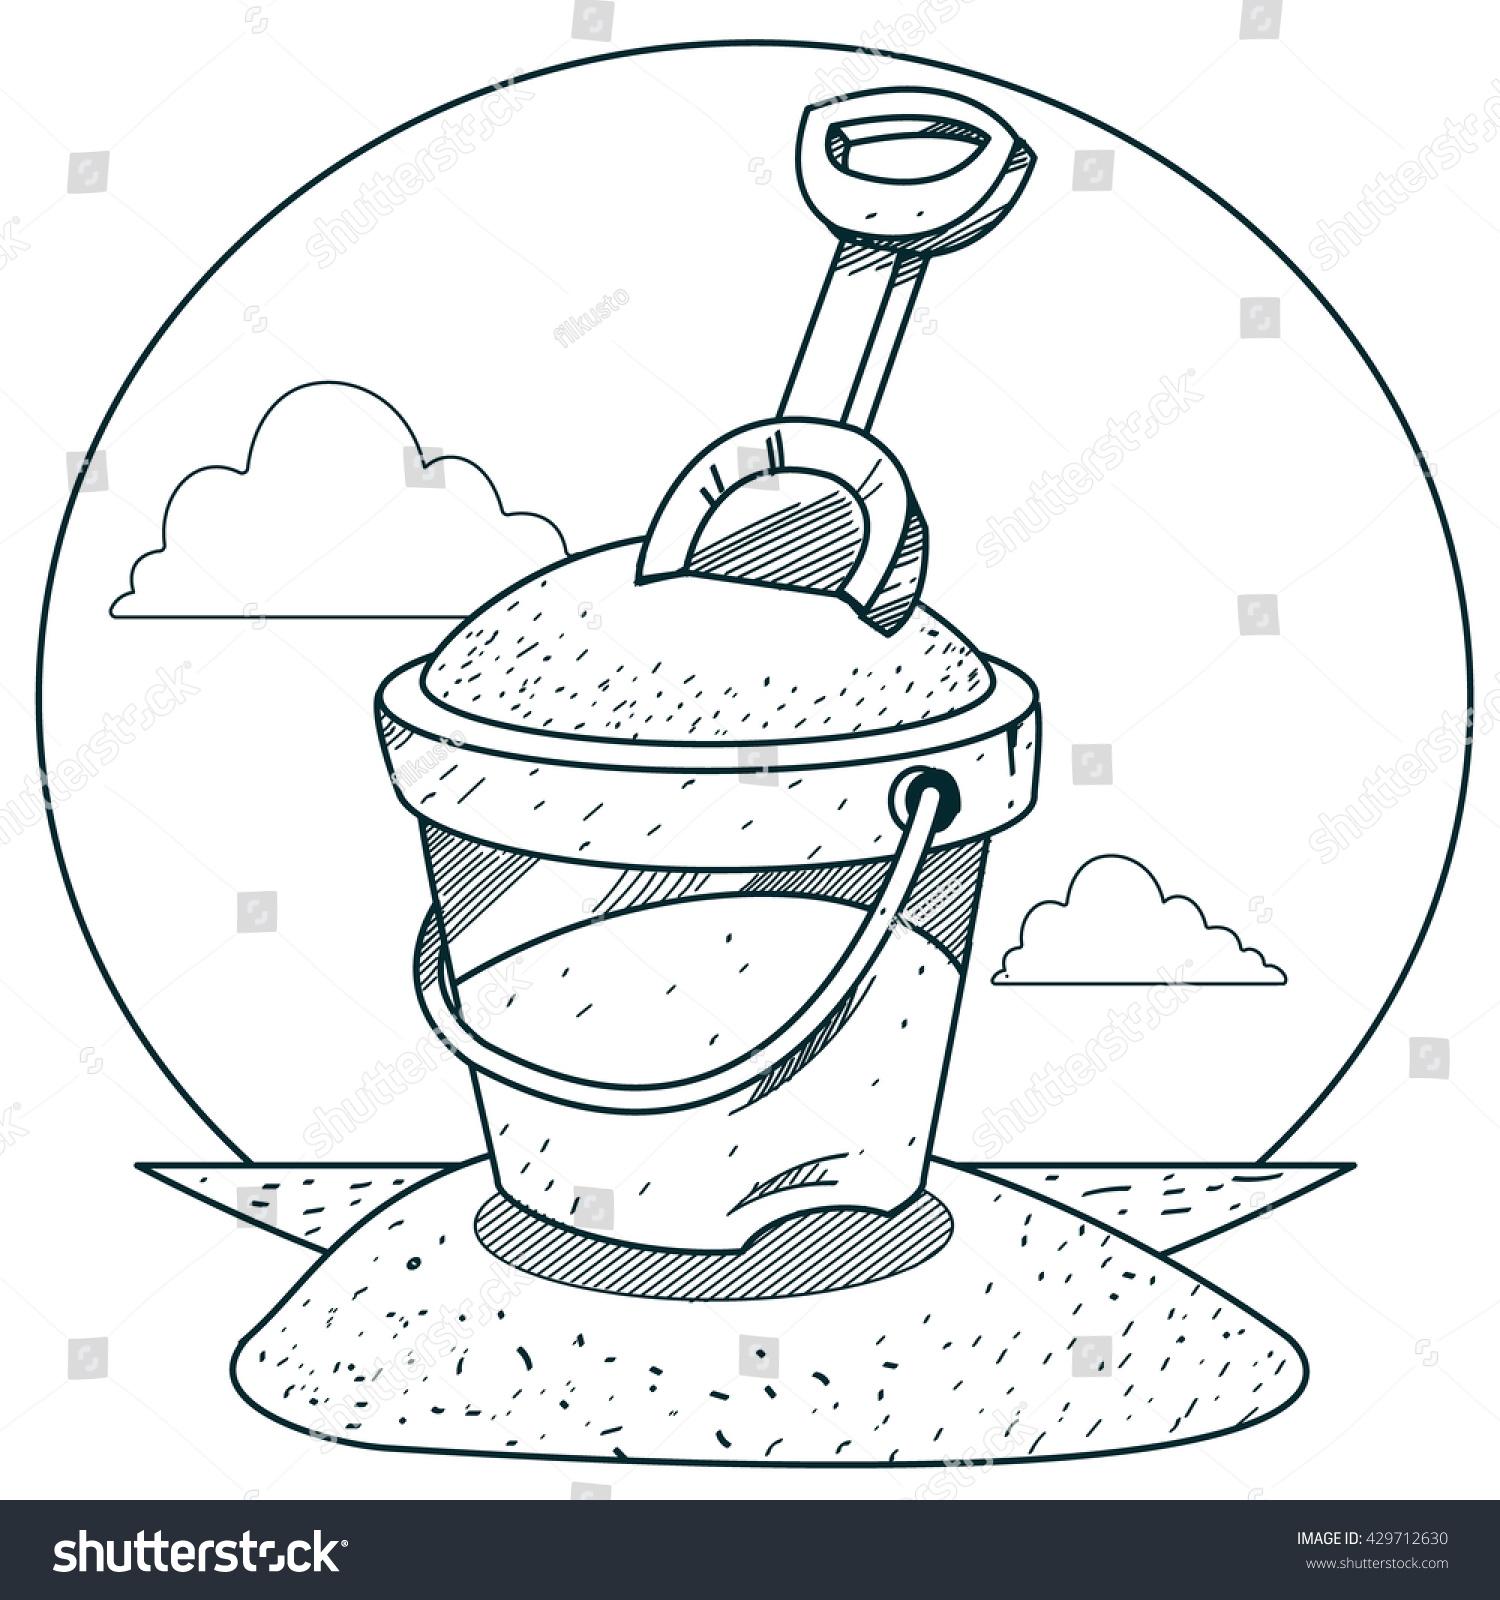 Toy Bucket Sand Rake Outline Drawings Stock Vector 429712630 ...